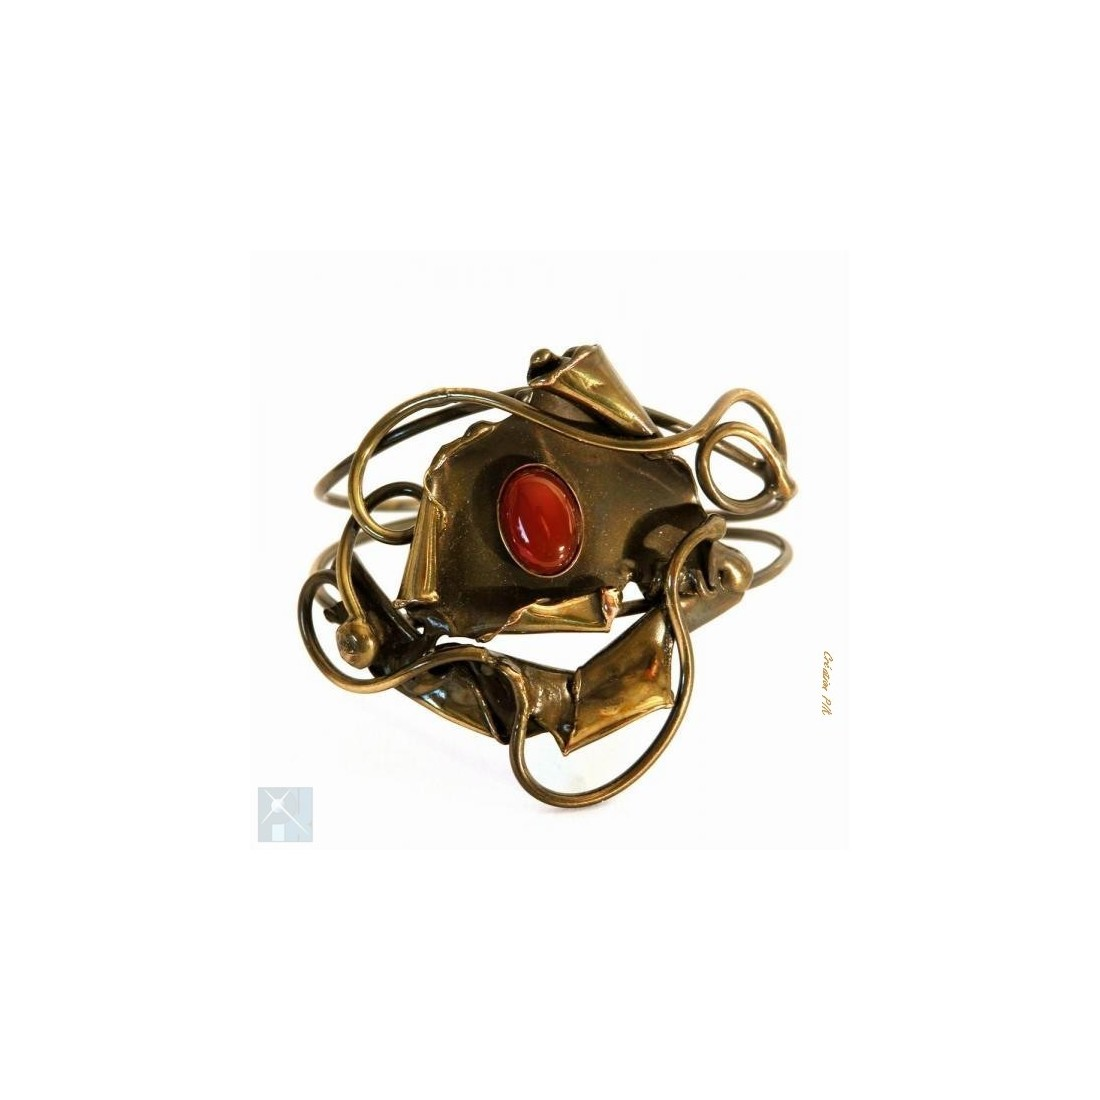 Bracelet baroque, création artisanale.